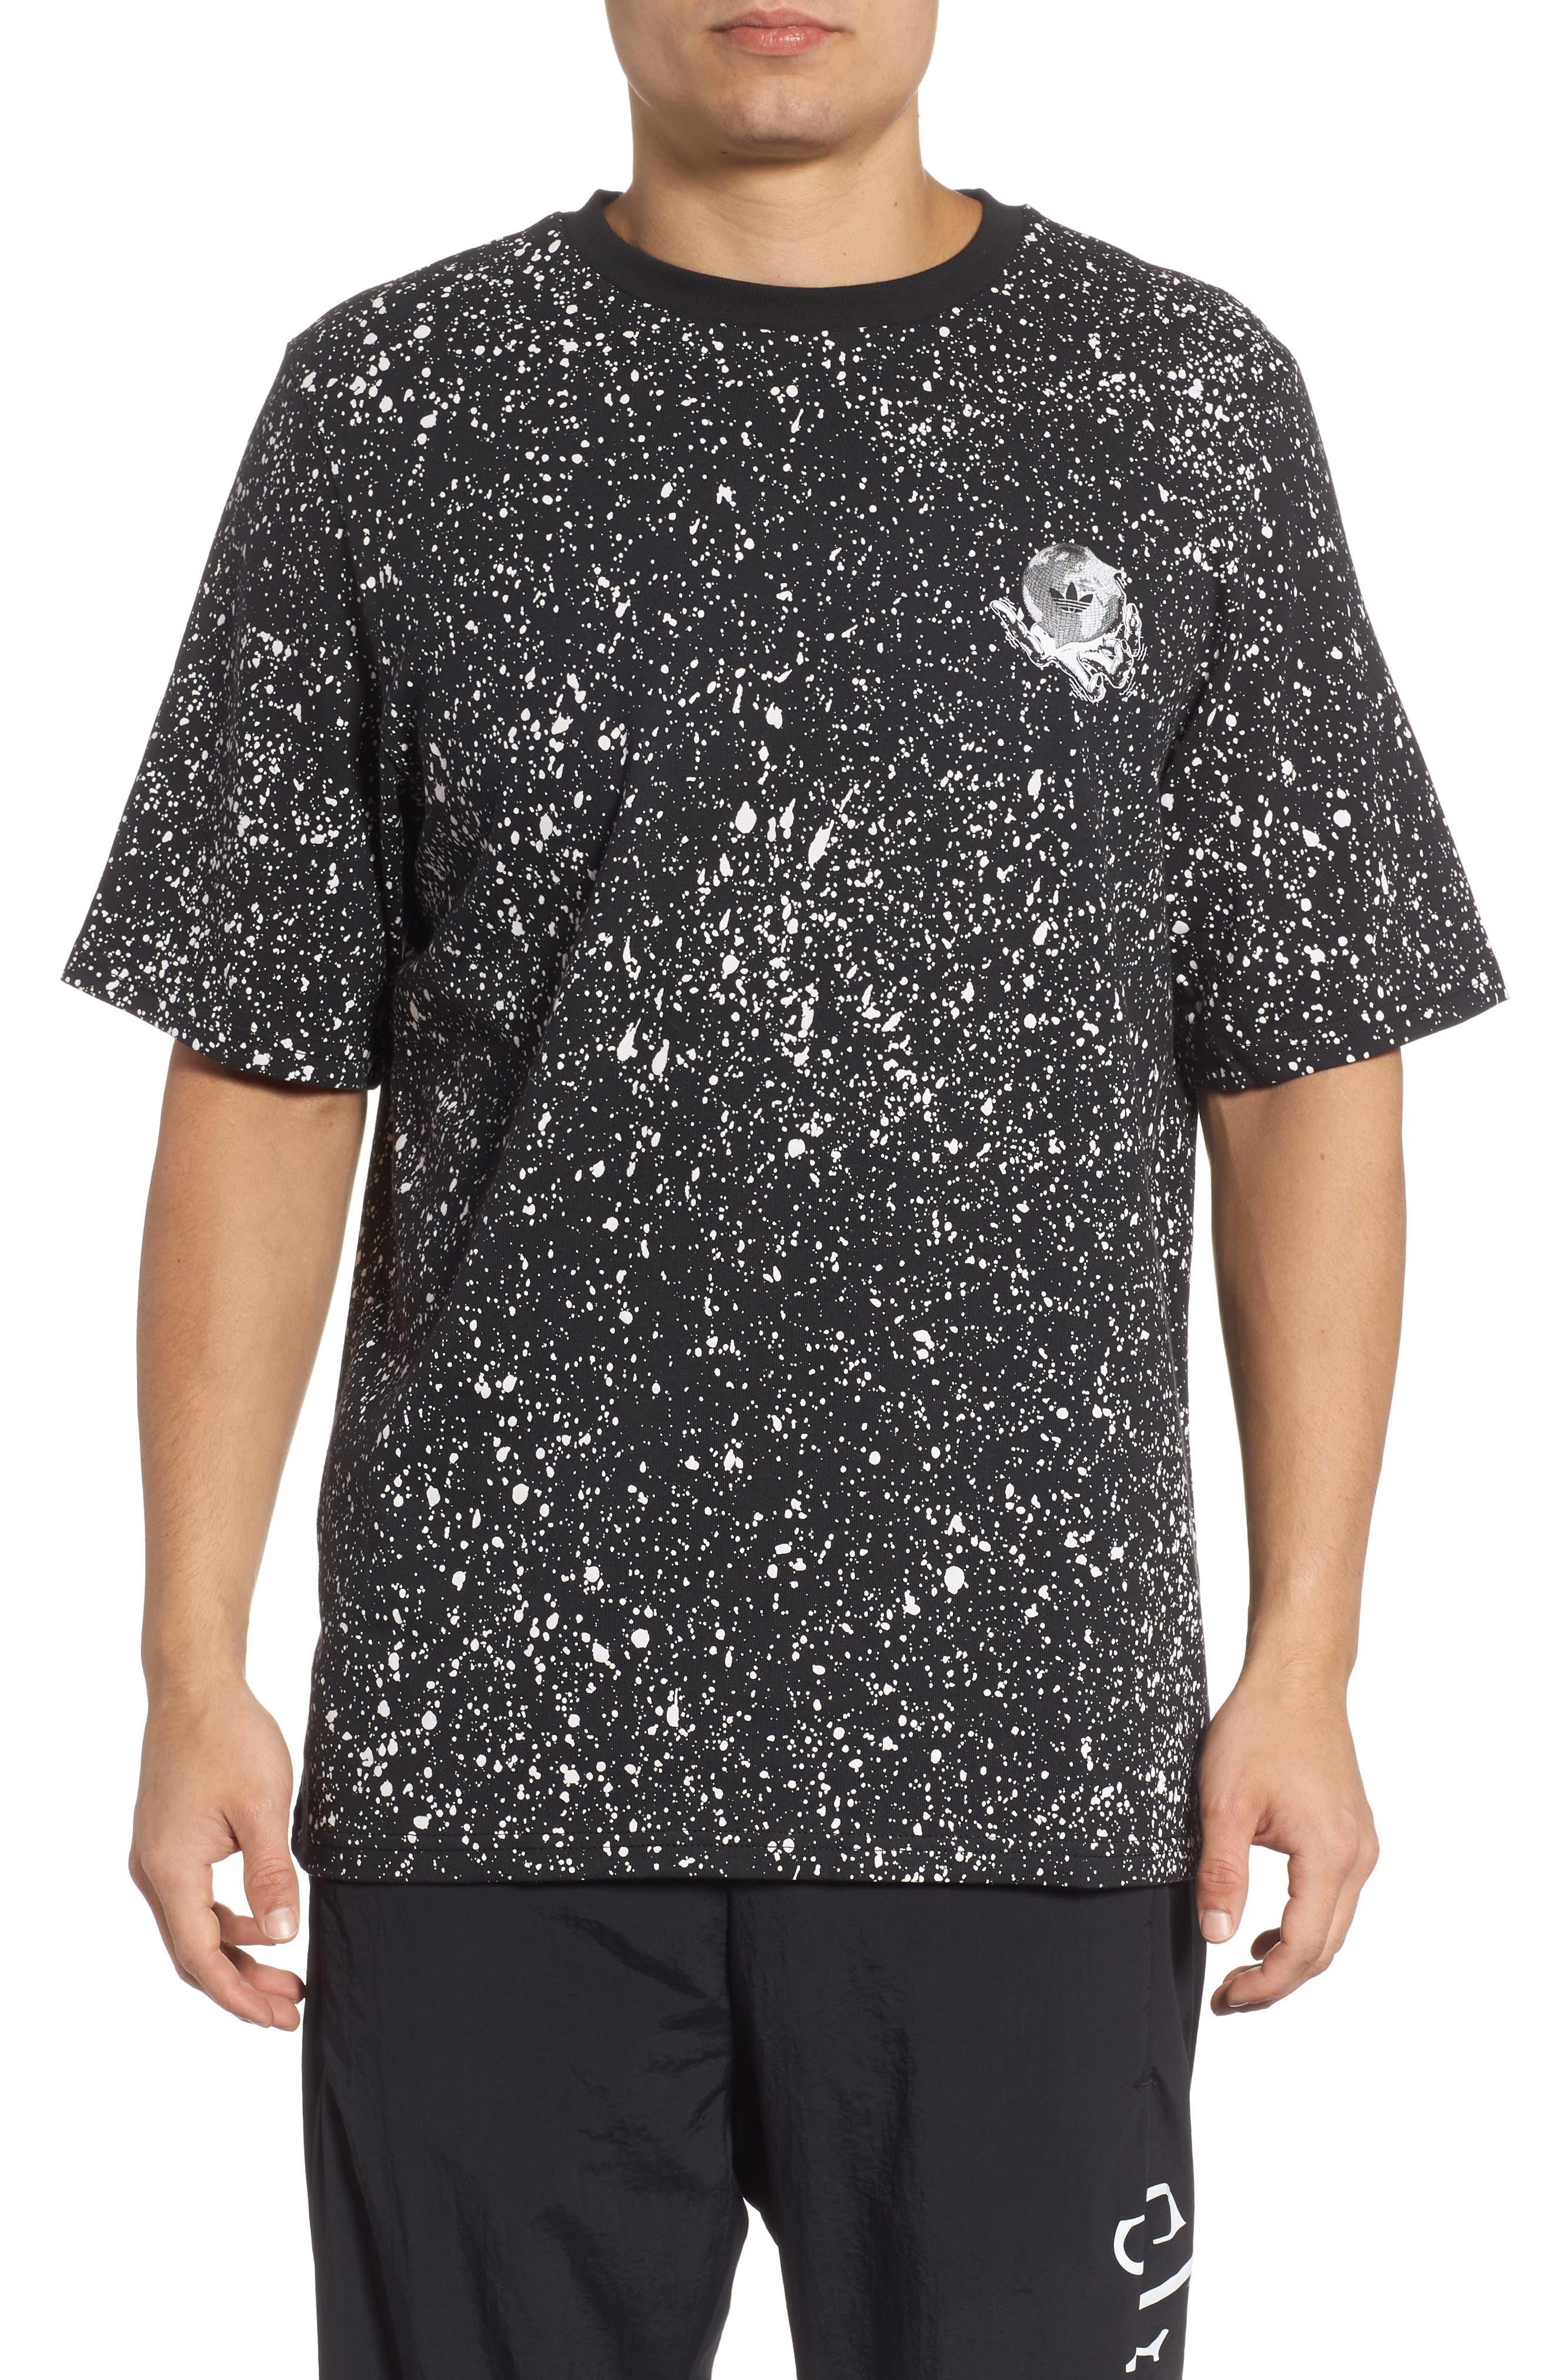 Adidas Originals Planetoid Allover Print T-Shirt, Black